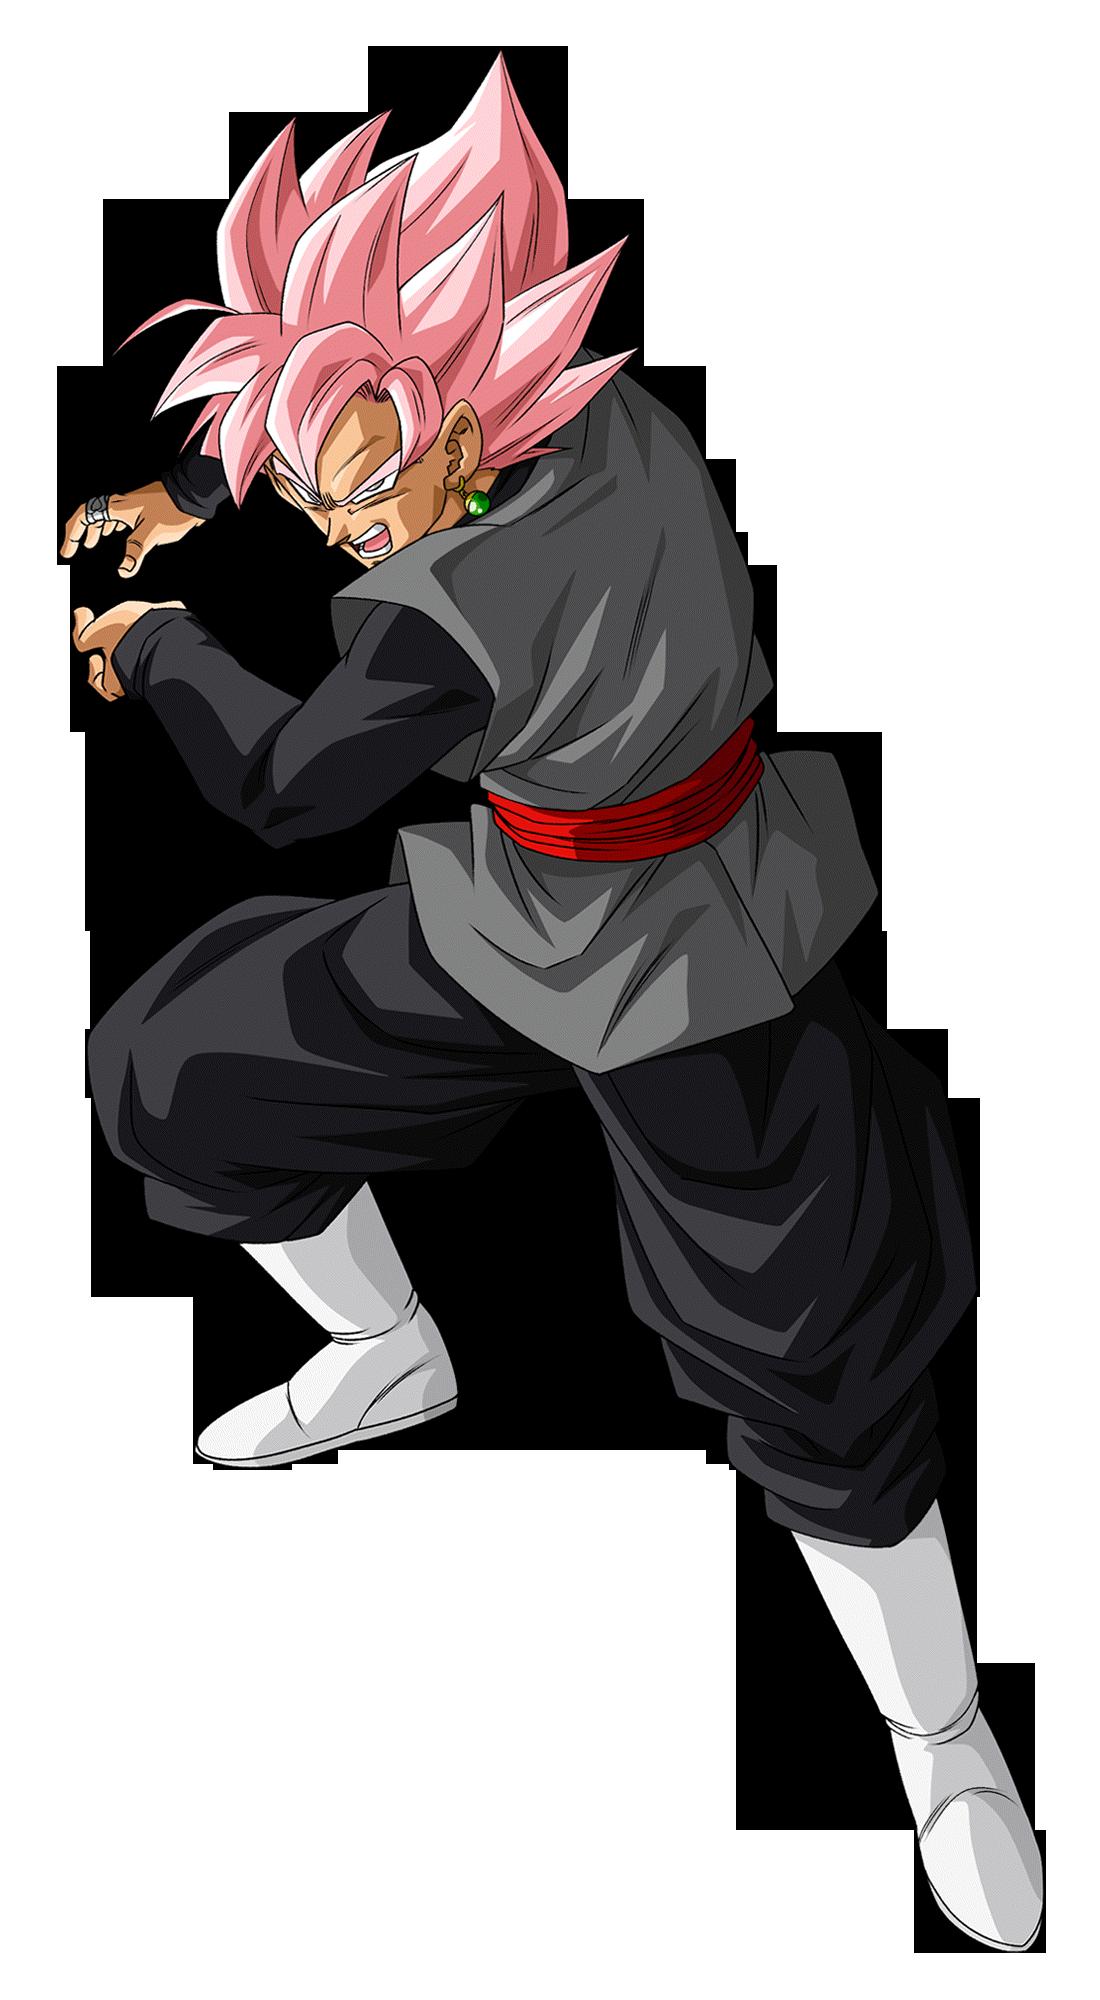 Goku Black Rose Render 3 Dokkan Battle By Maxiuchiha22 On Deviantart Goku Black Goku Anime Dragon Ball Super